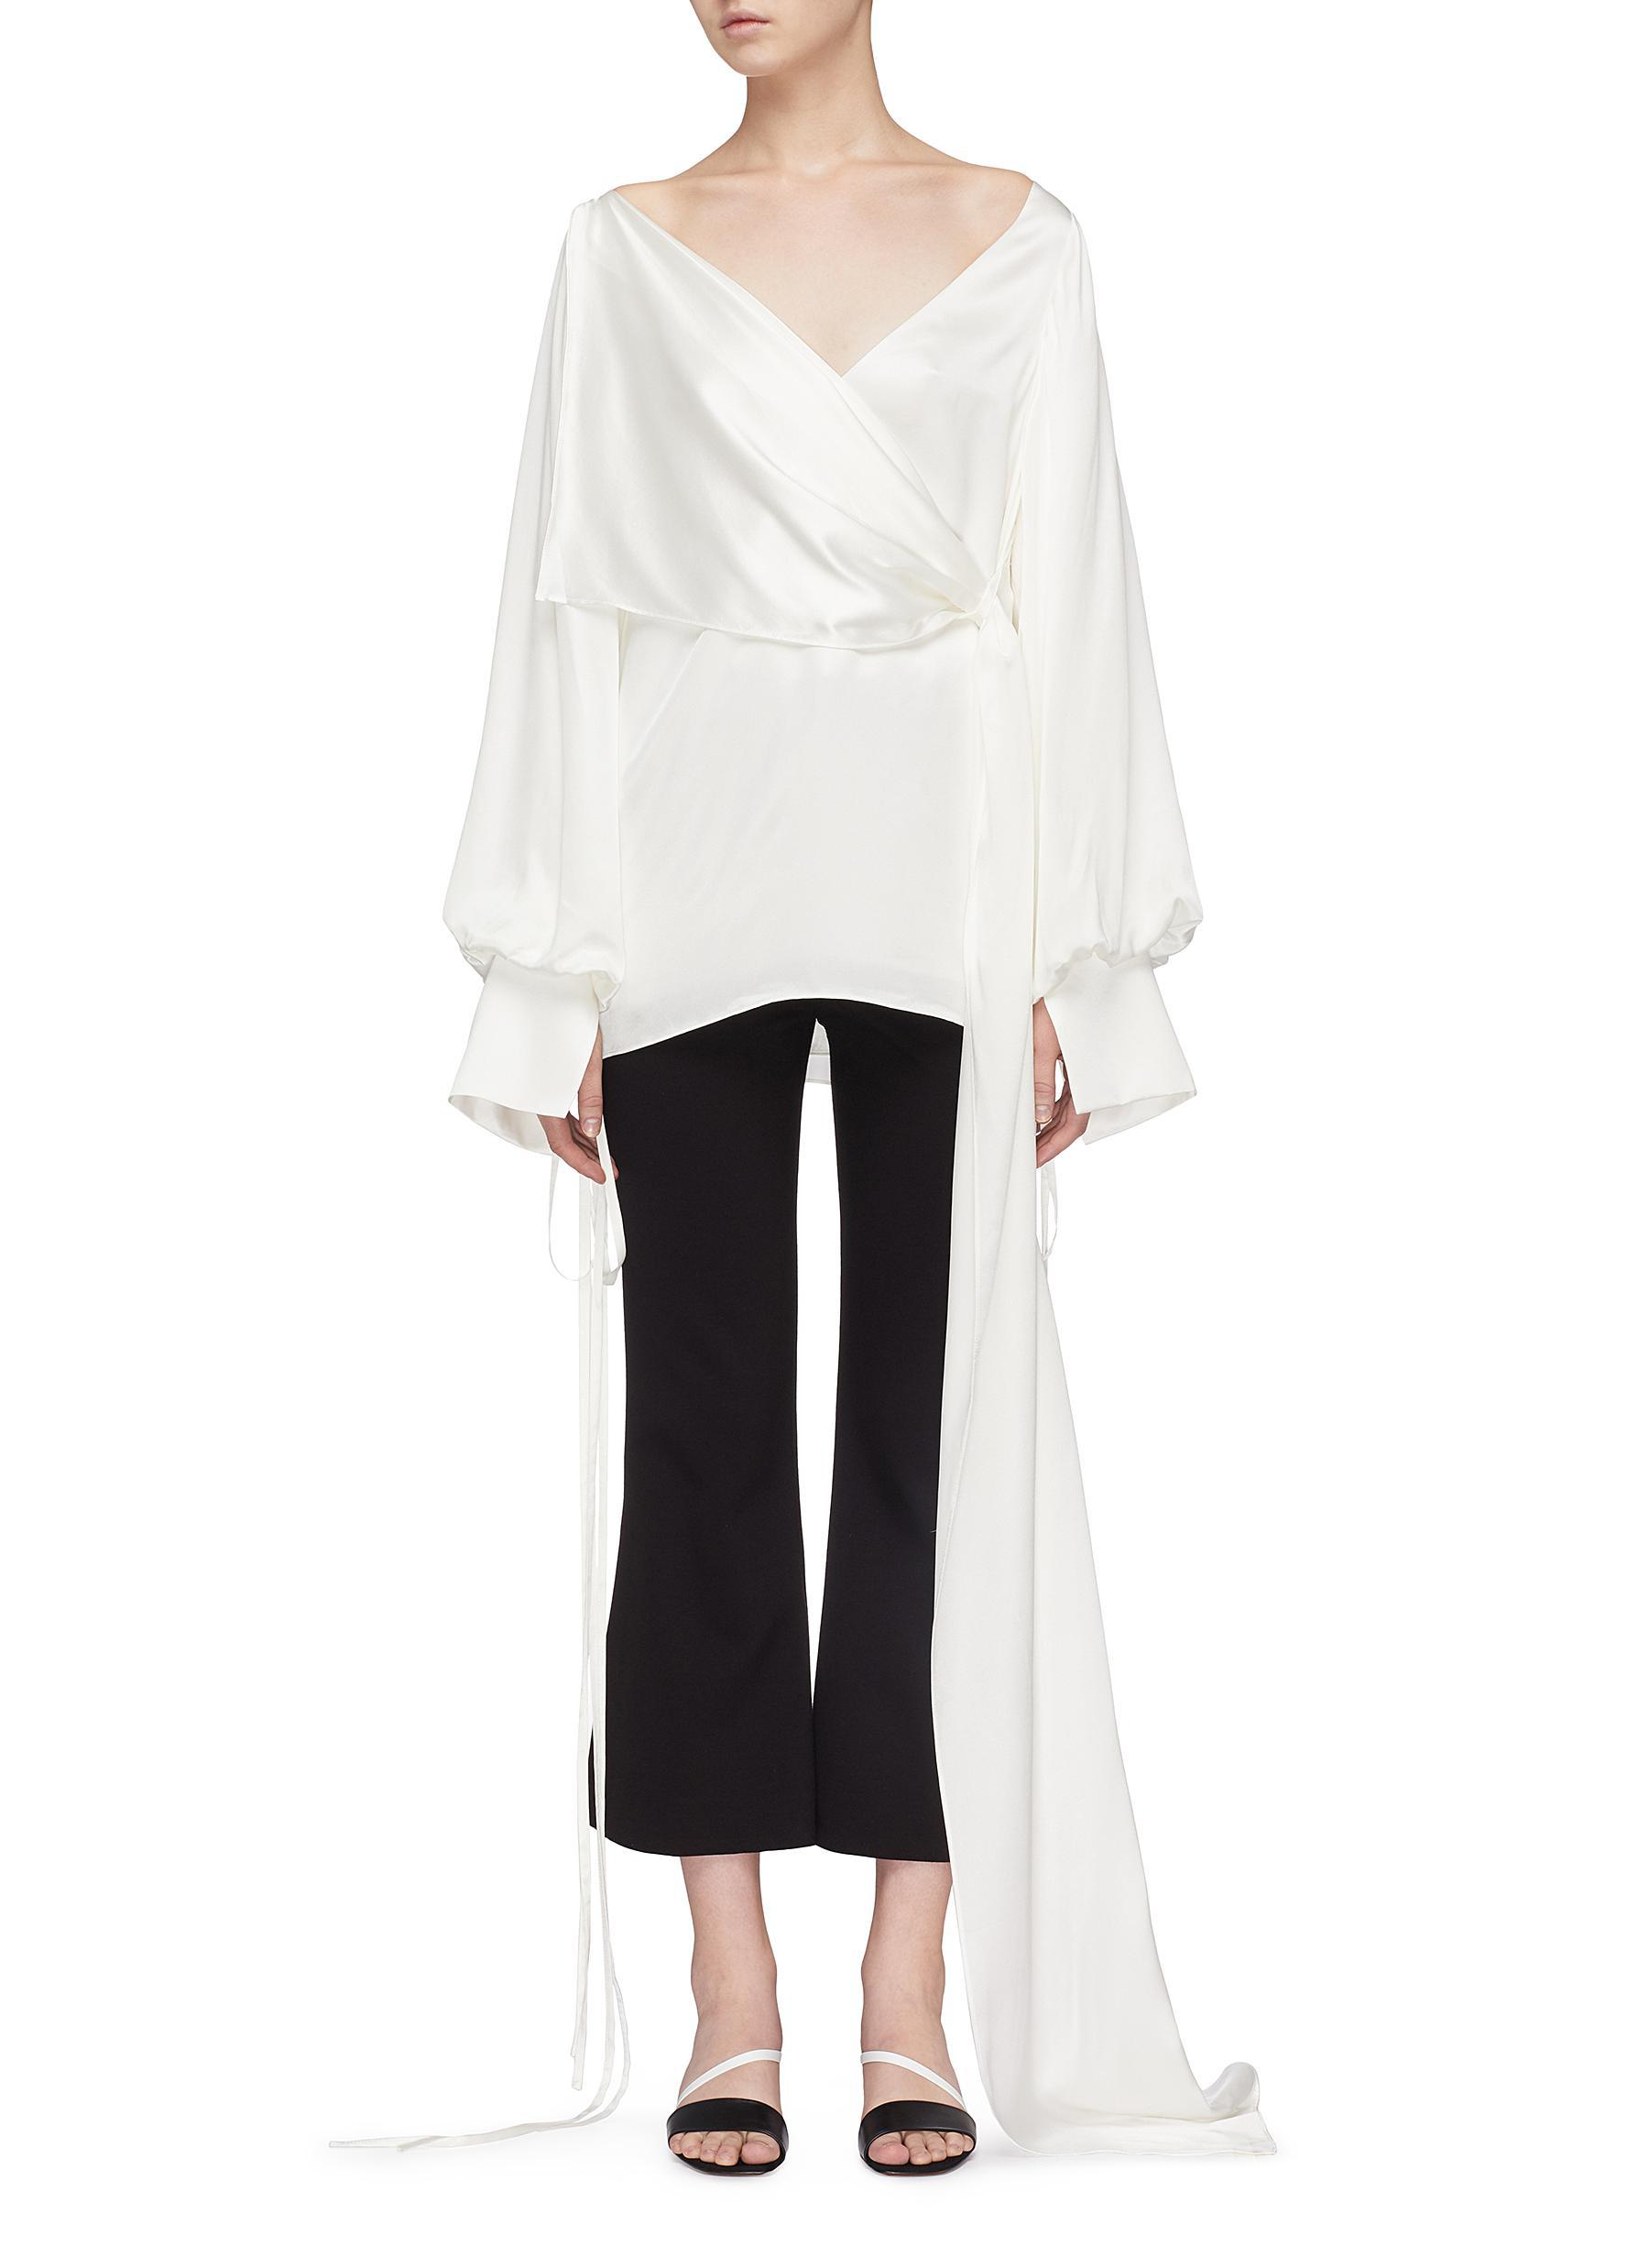 'dorita' In Tie Balloon London Sleeve Top Drape Sash Solace Silk qpSzMUV